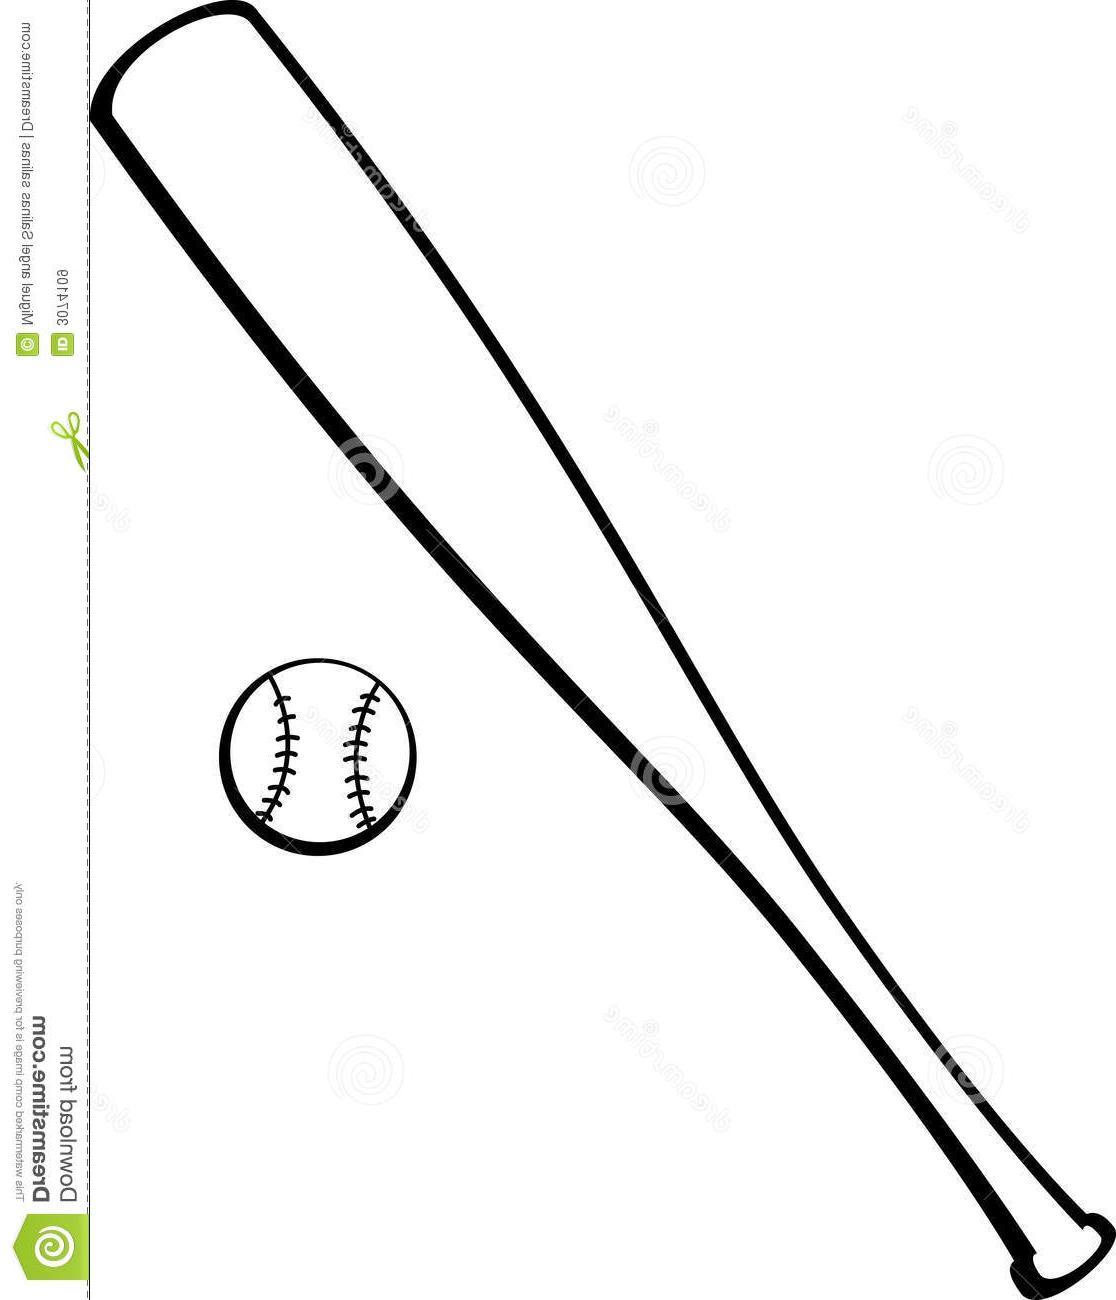 Baseball bat clipart vector free banner royalty free library HD Baseball Bat Outline Clip Art File Free » Free Vector Art, Images ... banner royalty free library